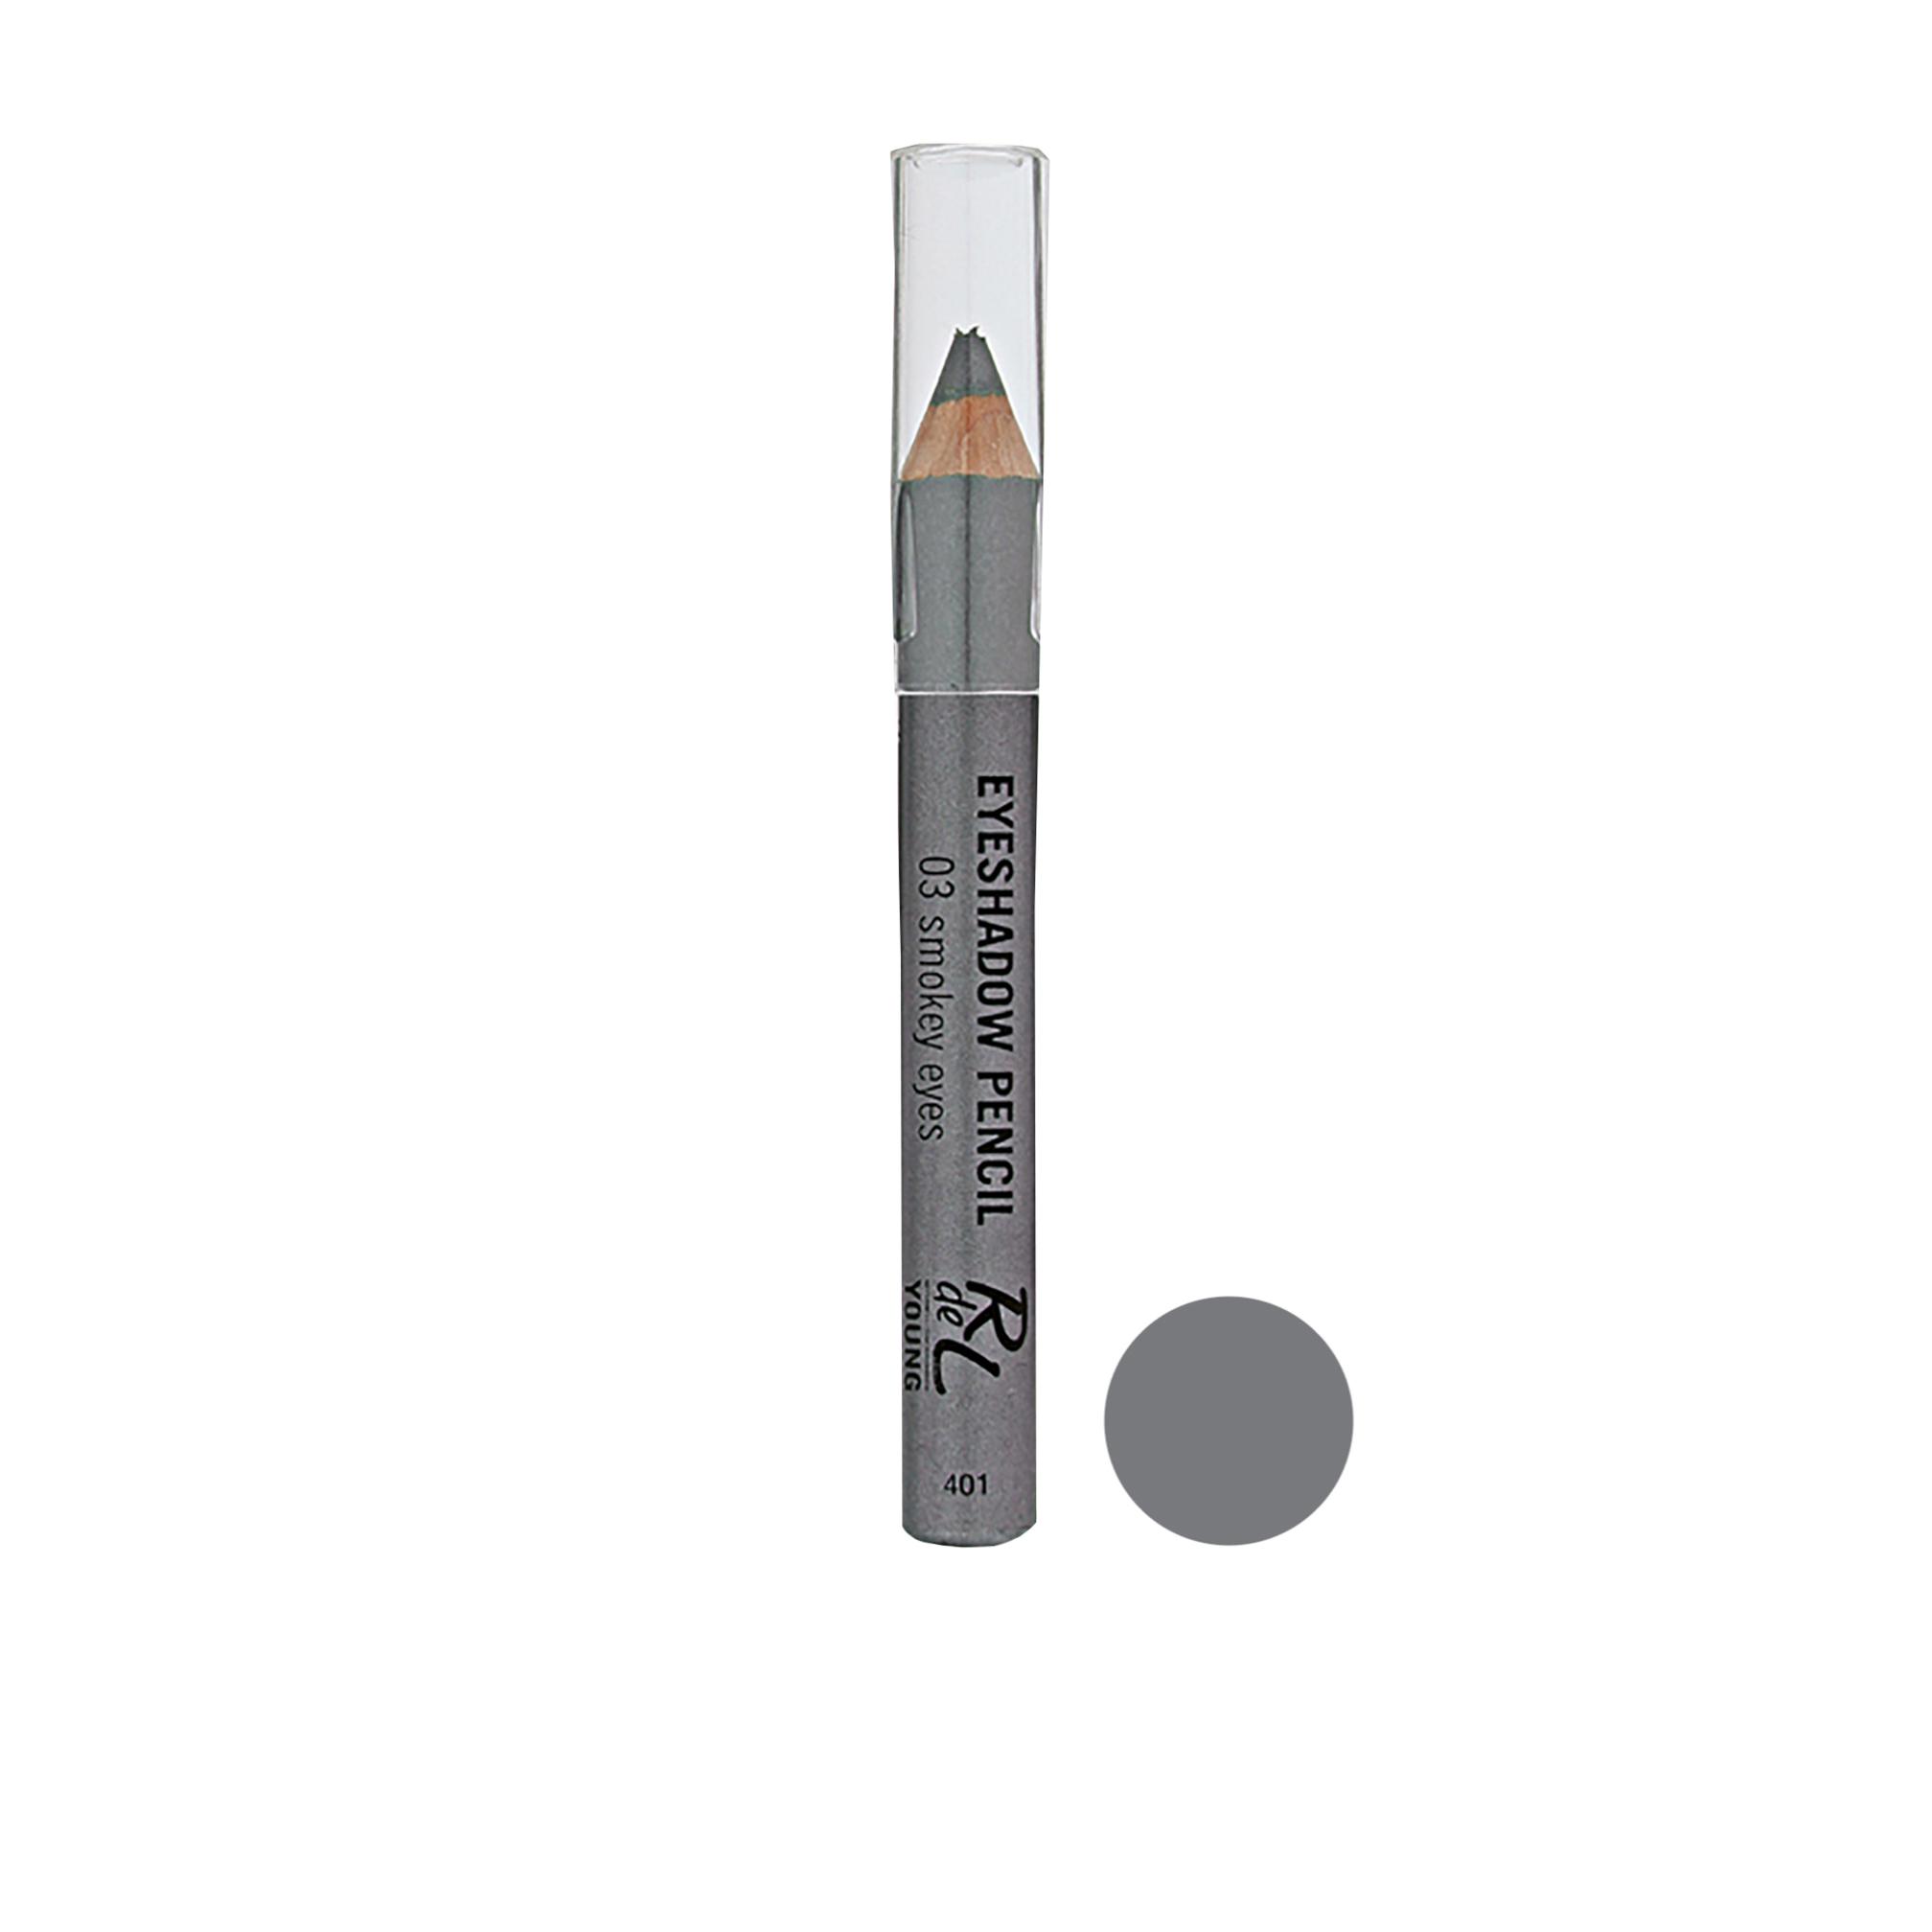 سایه چشم مدادی ریوال د یانگ شماره 03